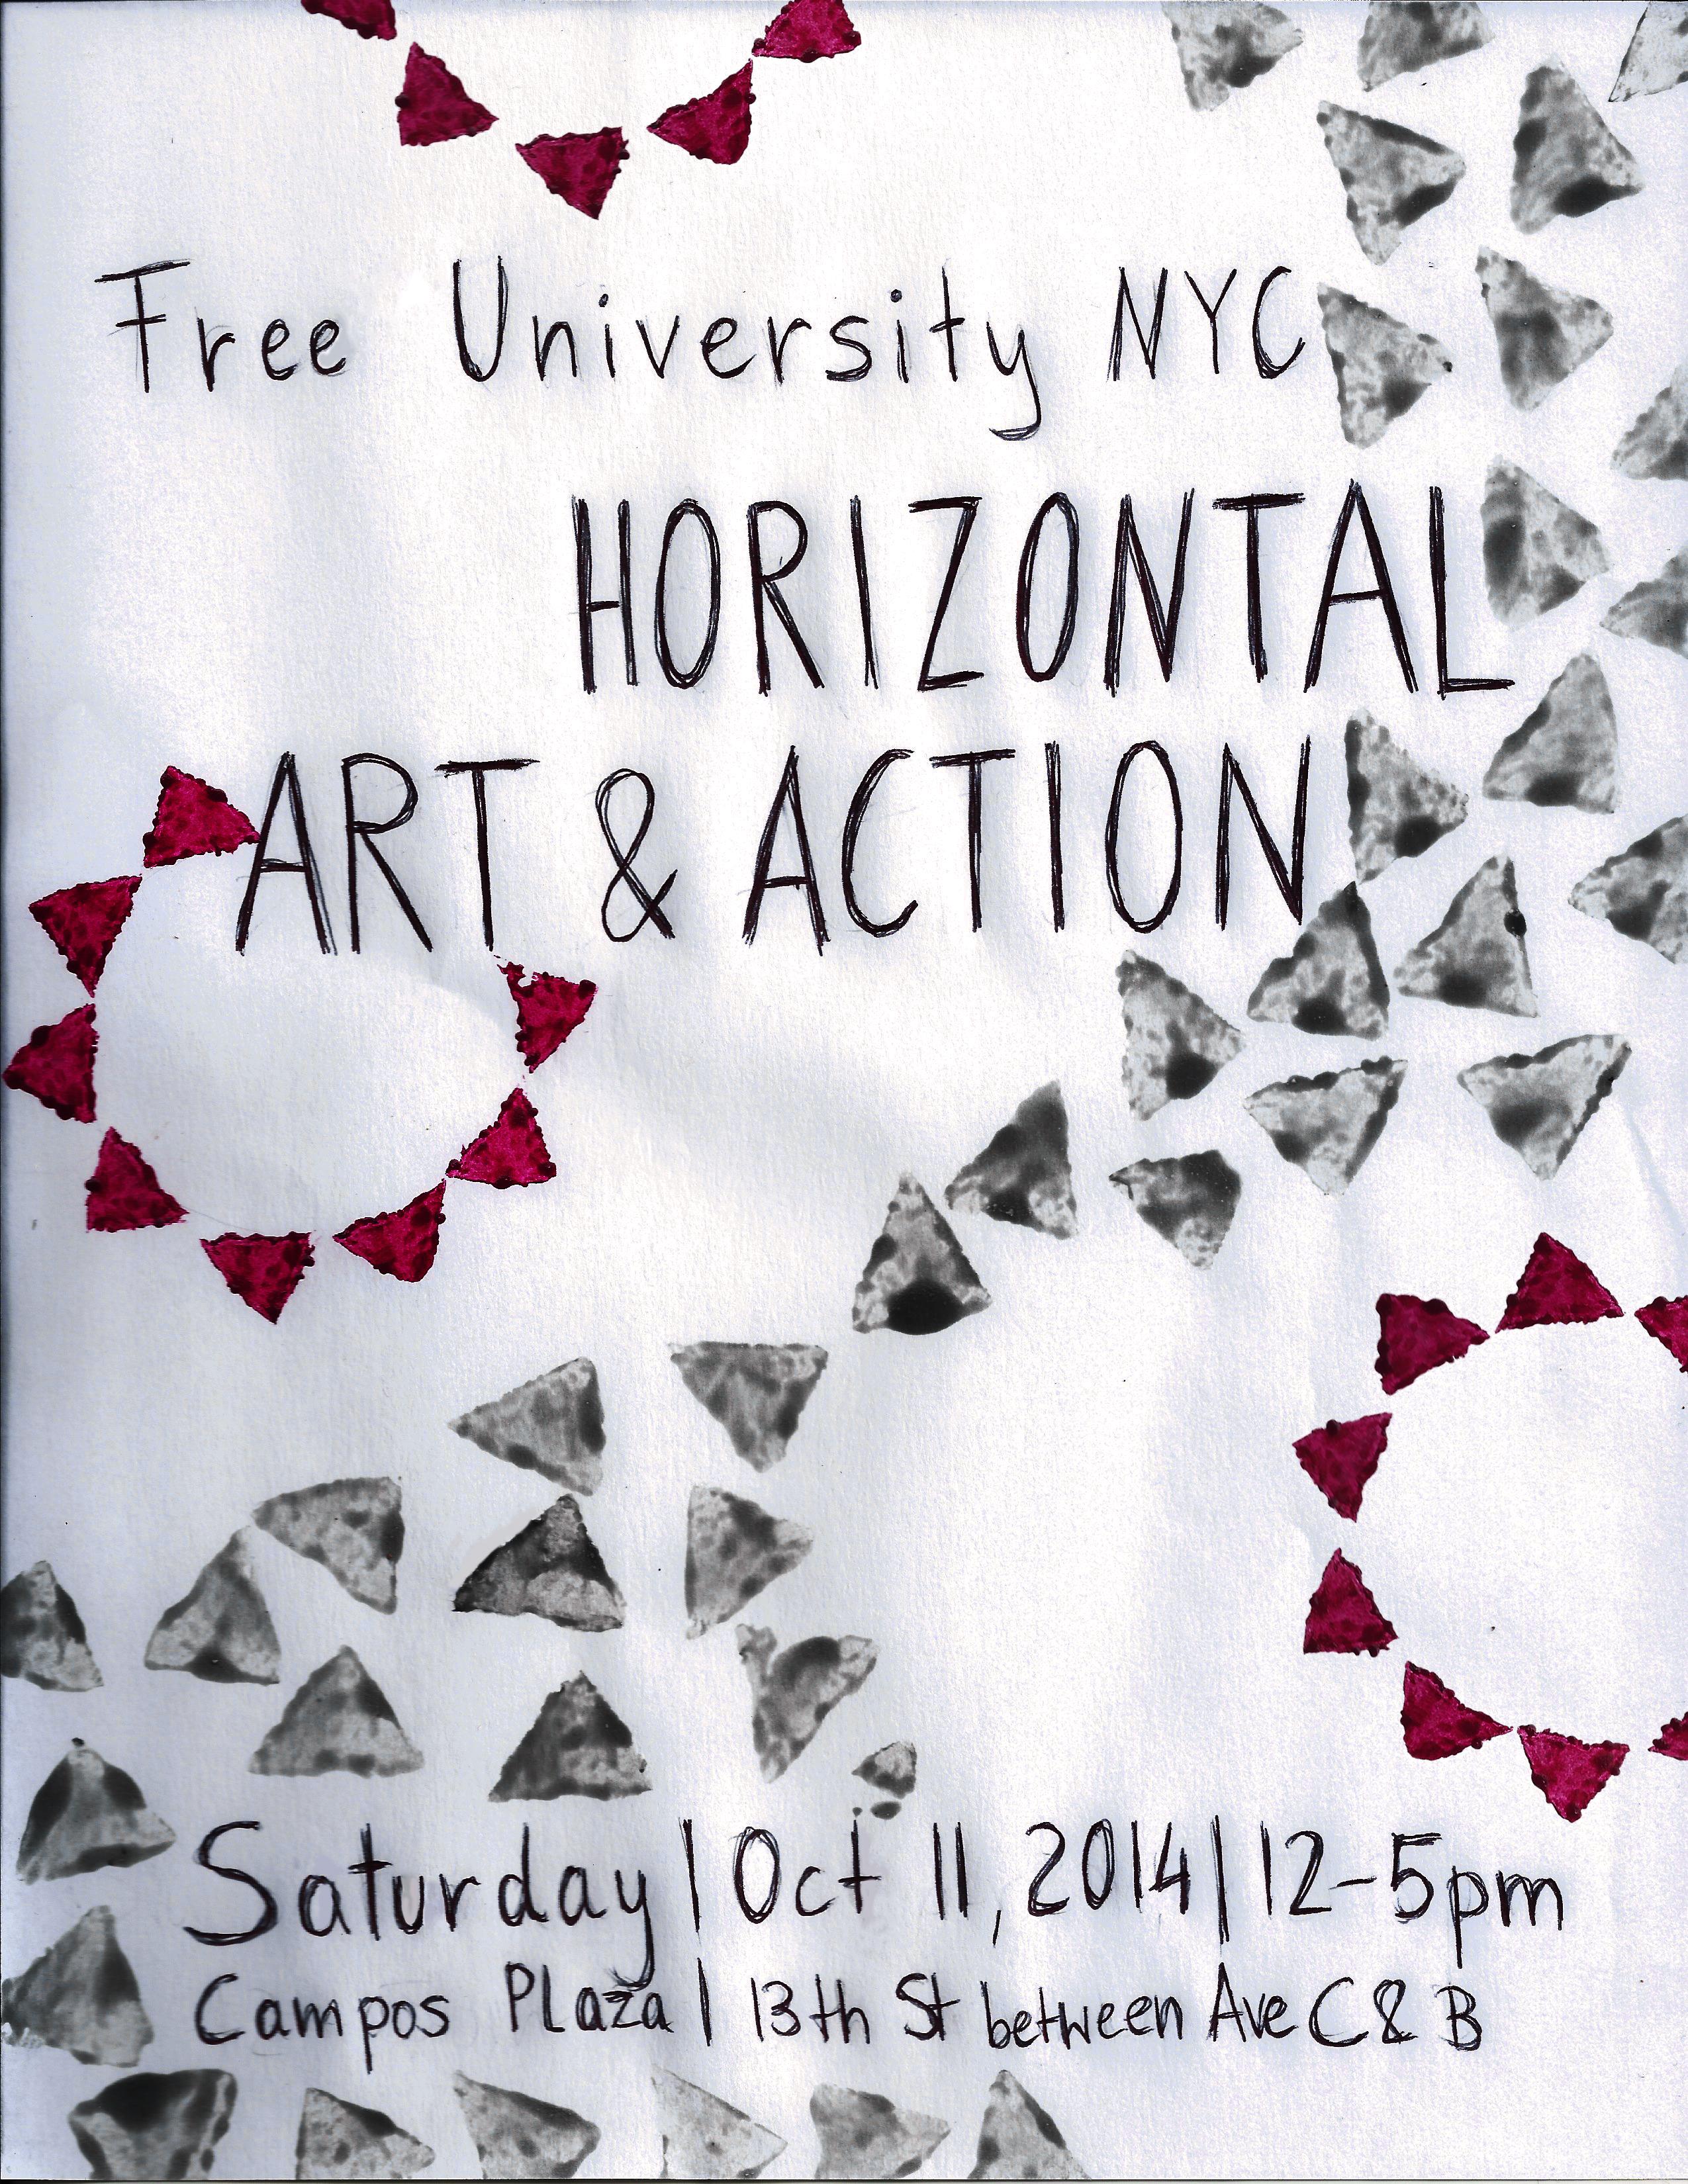 Horizontal Art & Action_poster2